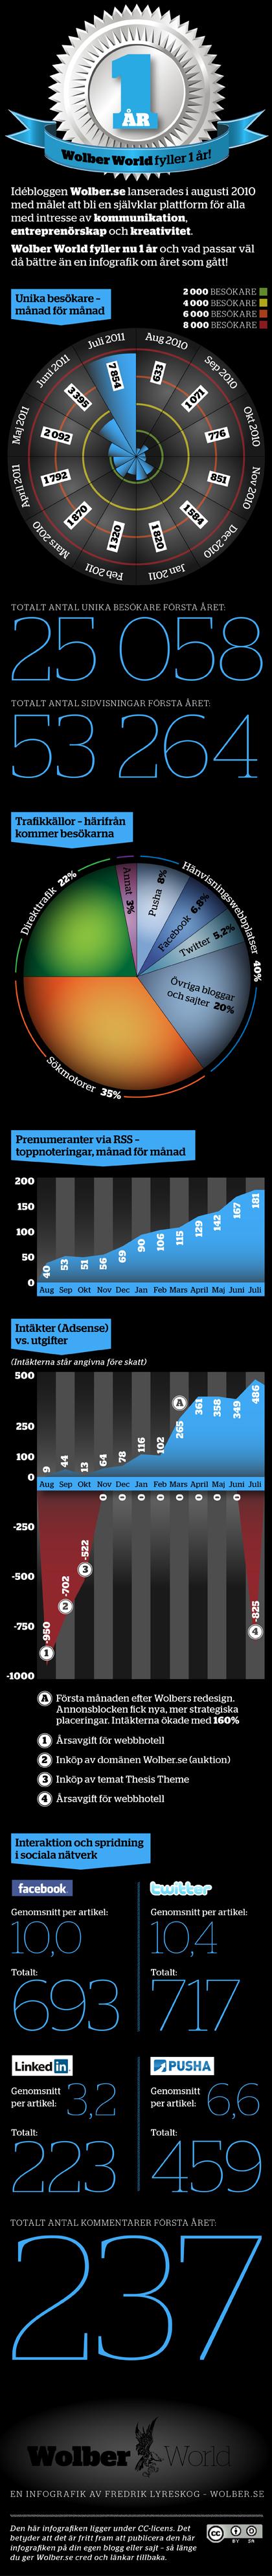 Infografik, pengar, adsense, blogg, trafik, sociala medier